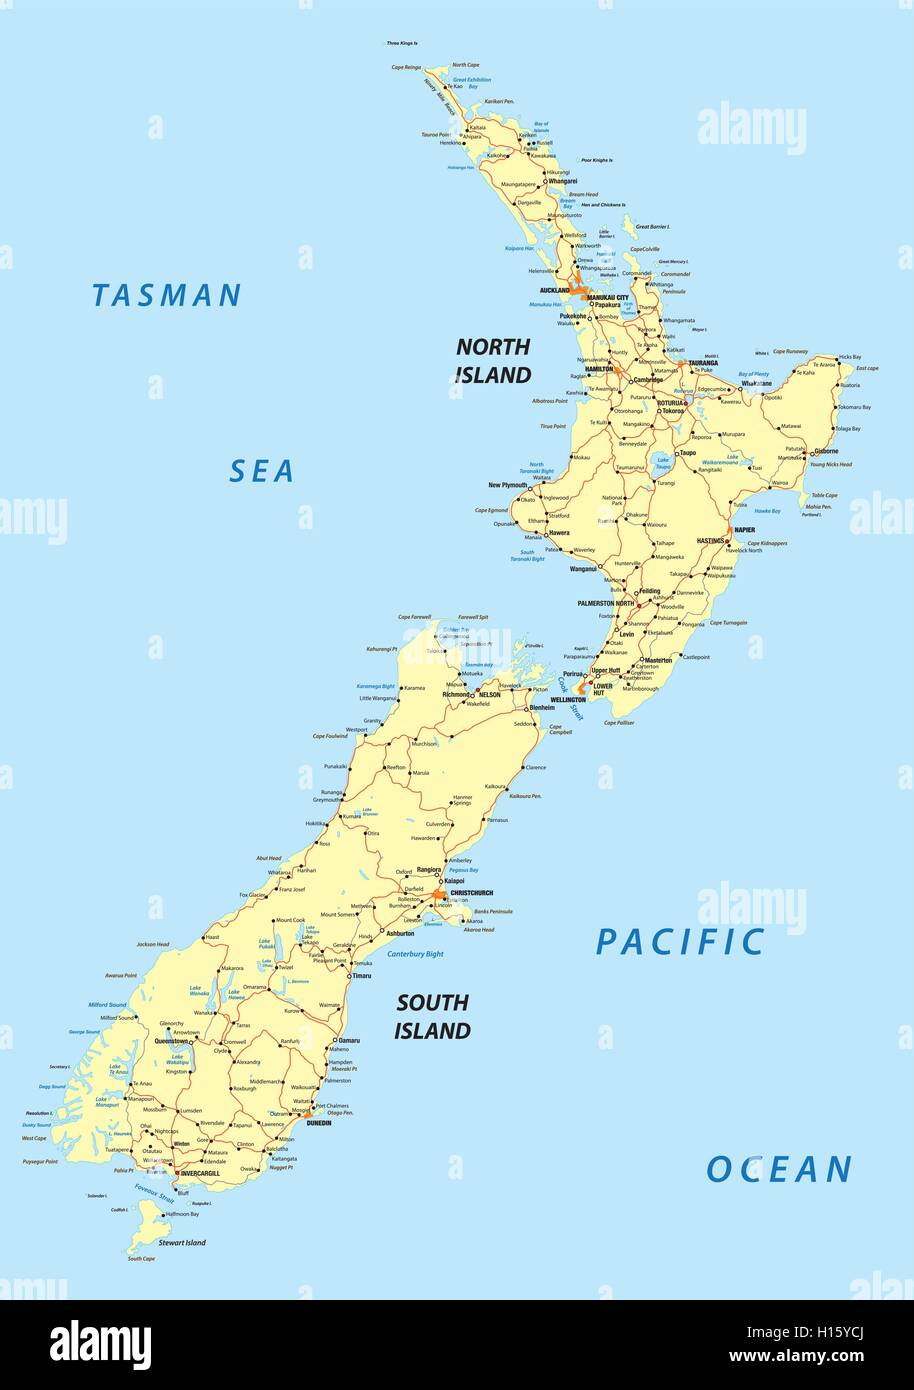 New Zealand Driving Map.New Zealand Road Map Stock Vector Art Illustration Vector